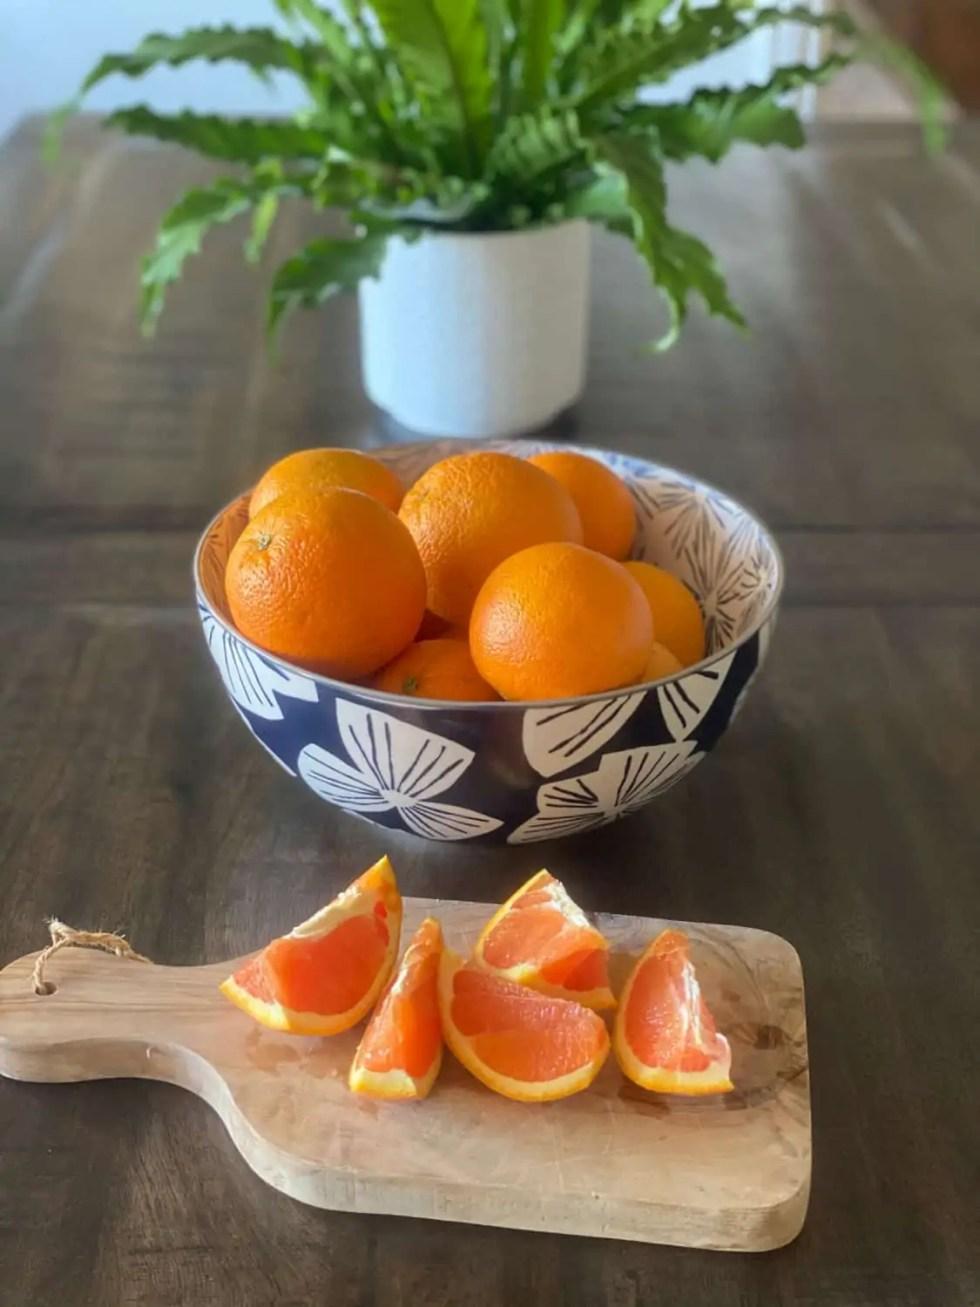 Healthy Orange Snack